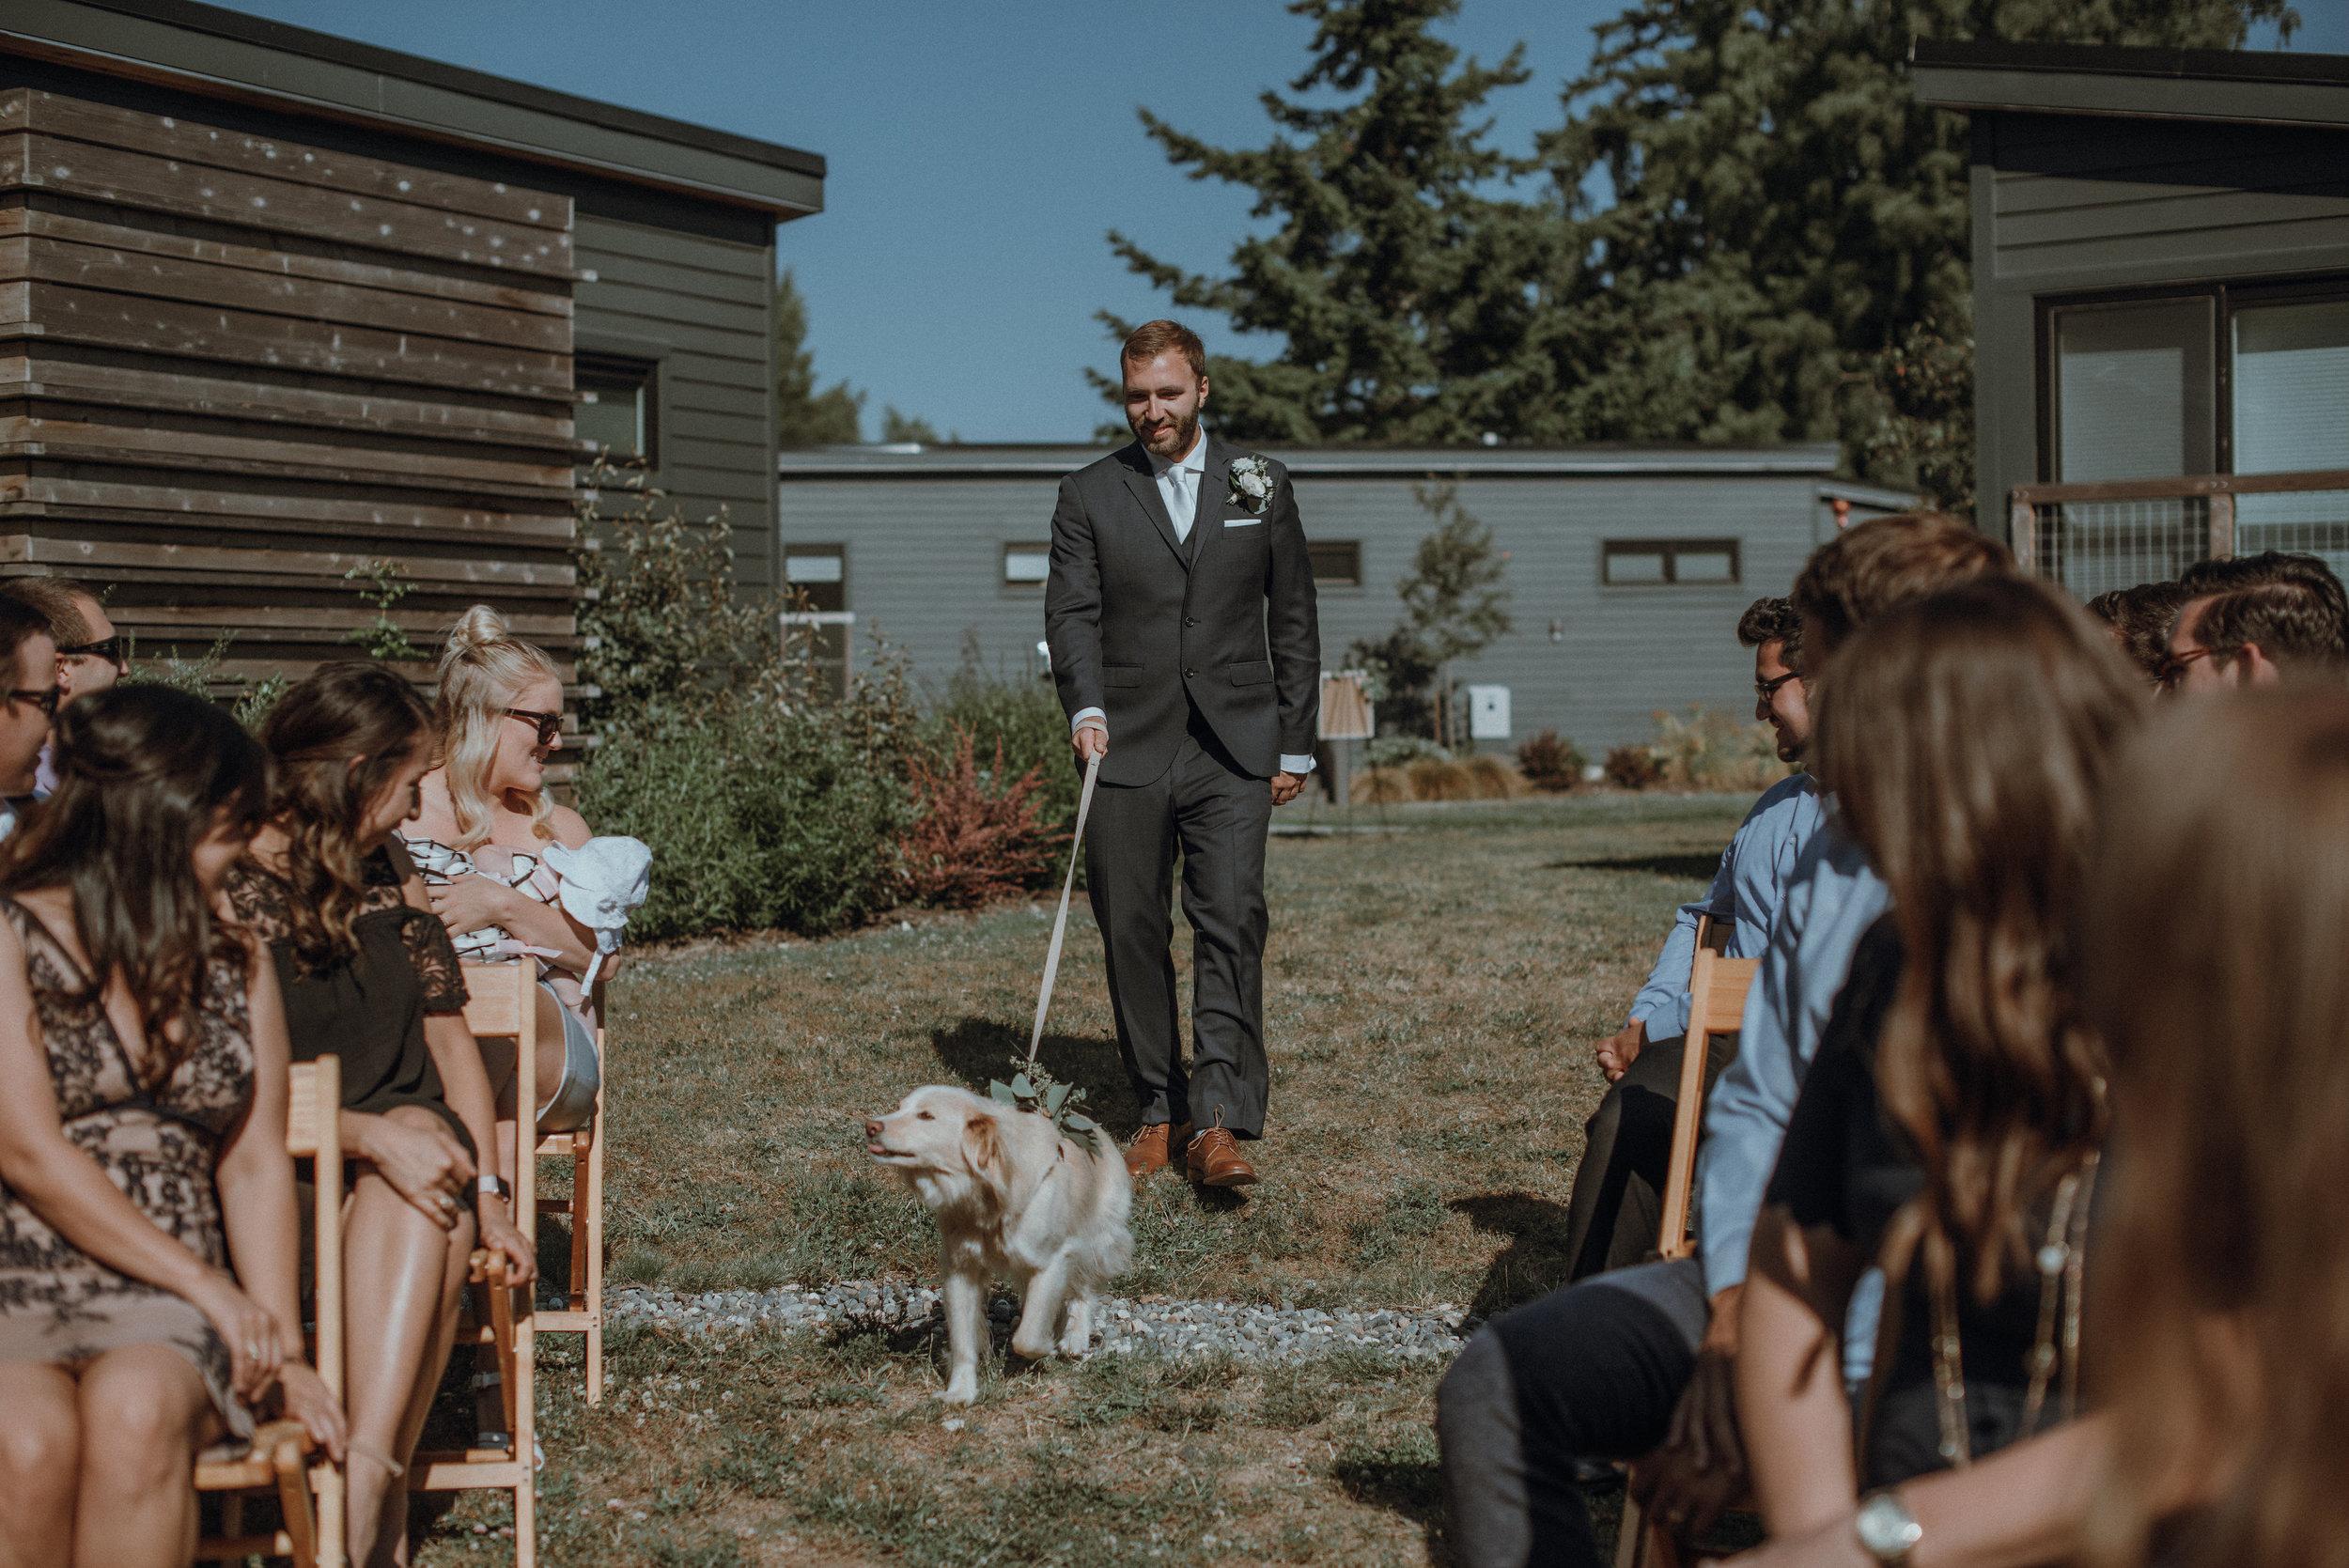 Lodges-at-Vashon-wedding3.jpg